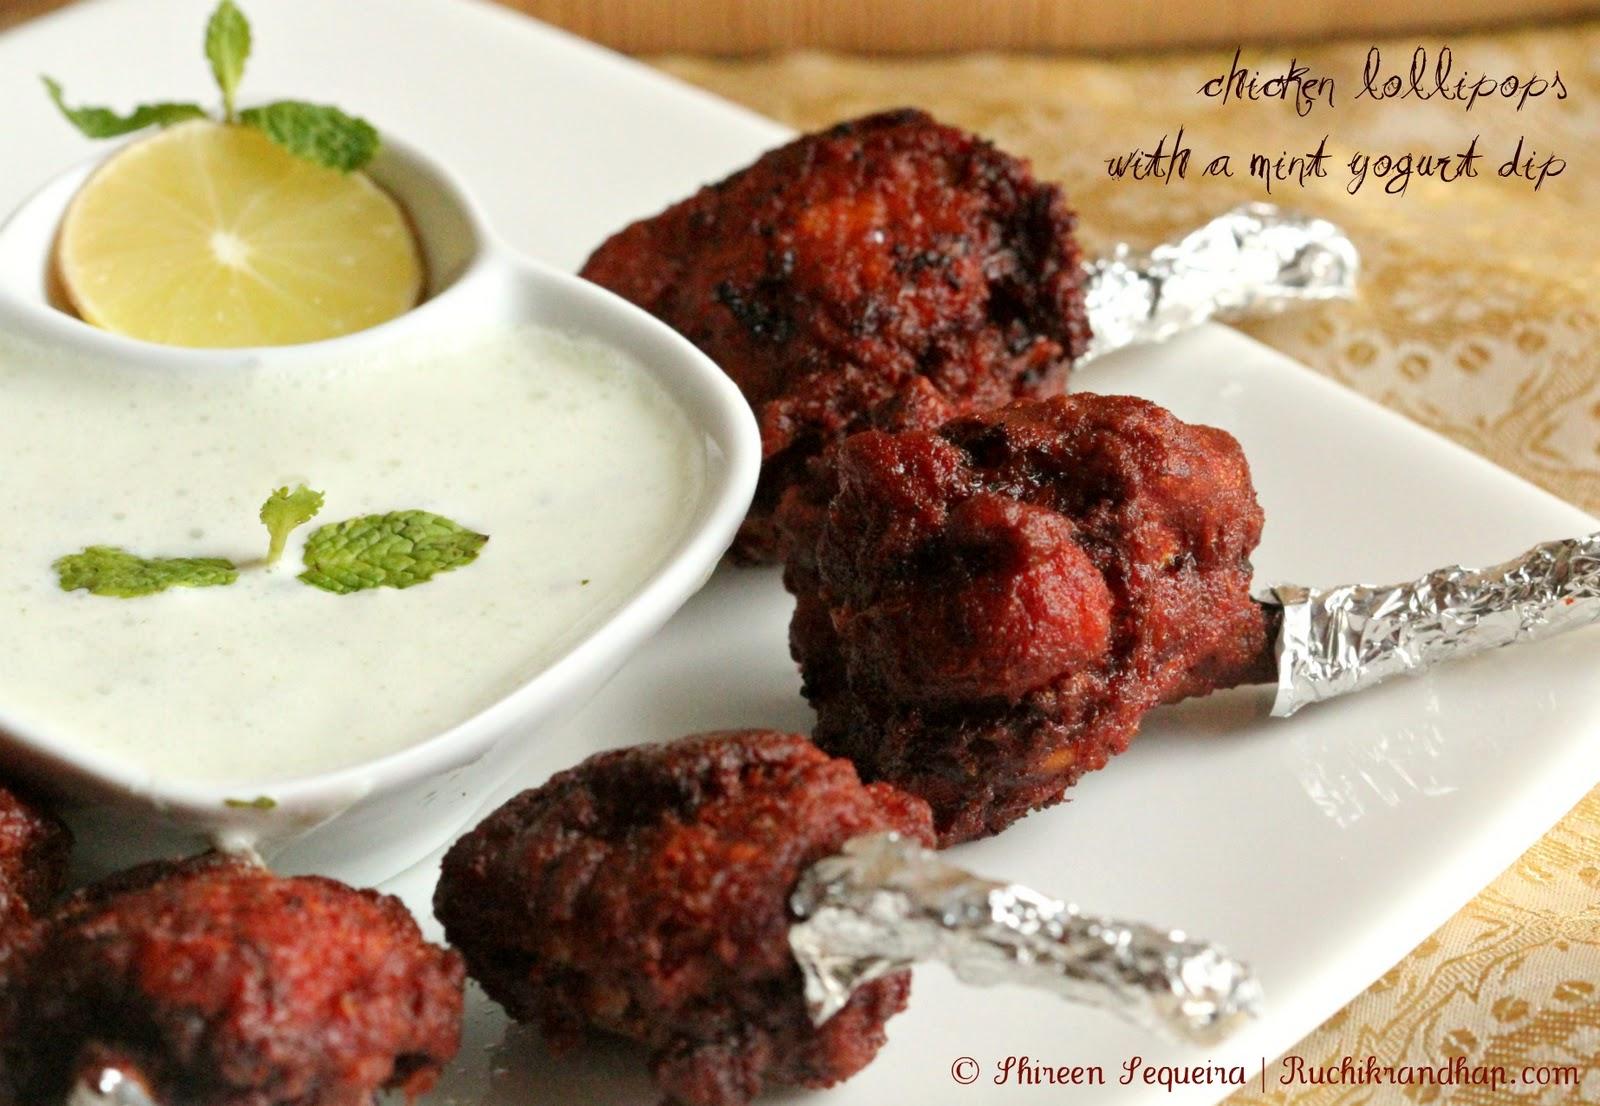 Ruchik Randhap (Delicious Cooking): Chicken Lollipops